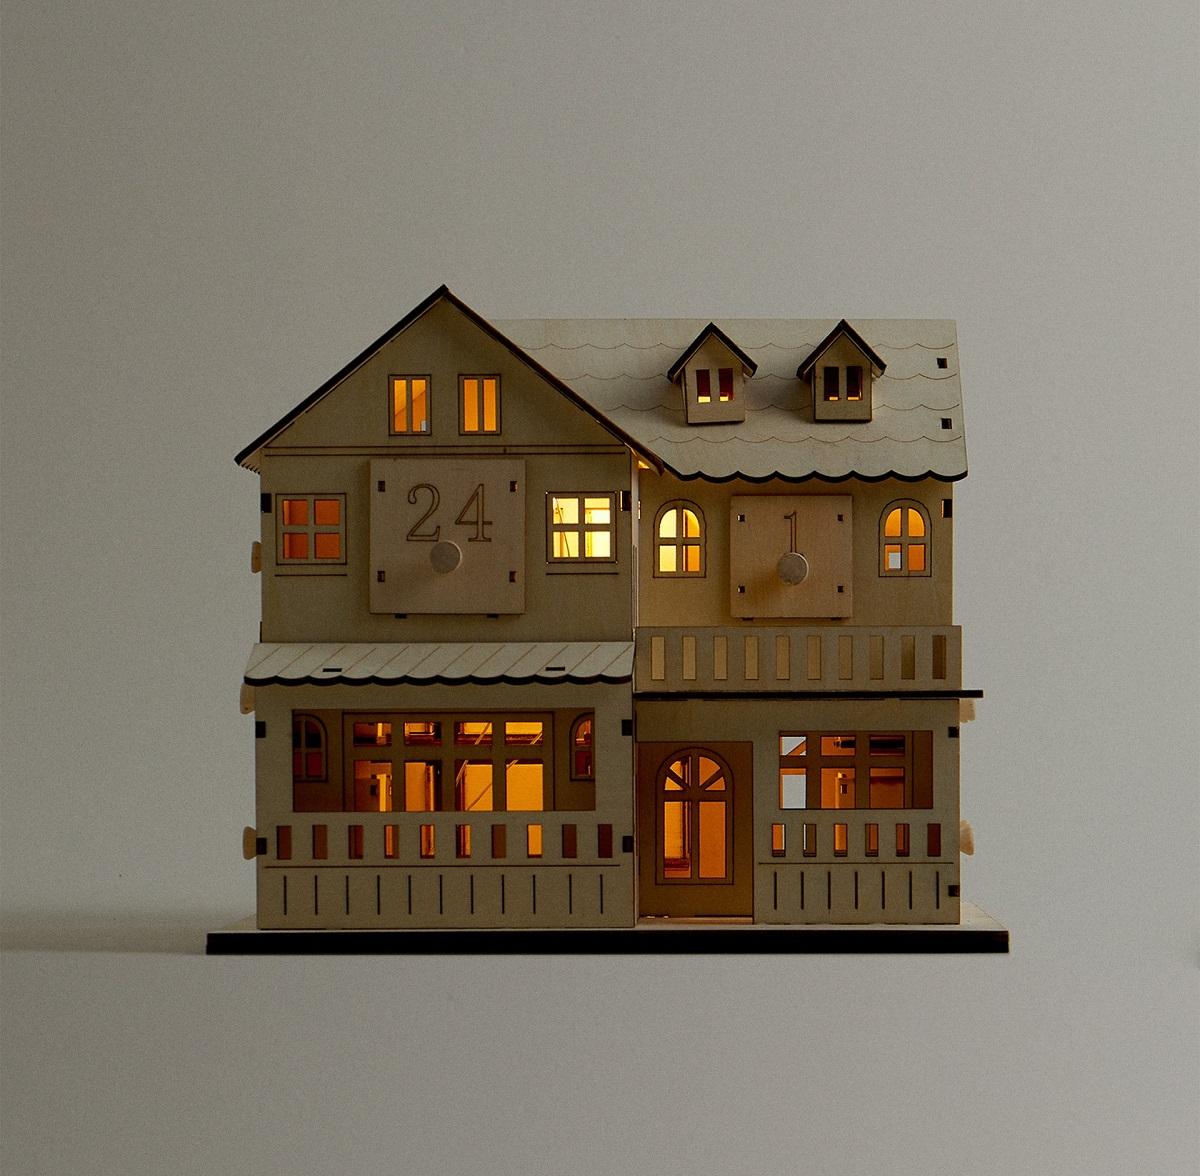 Calendario con forma de casita